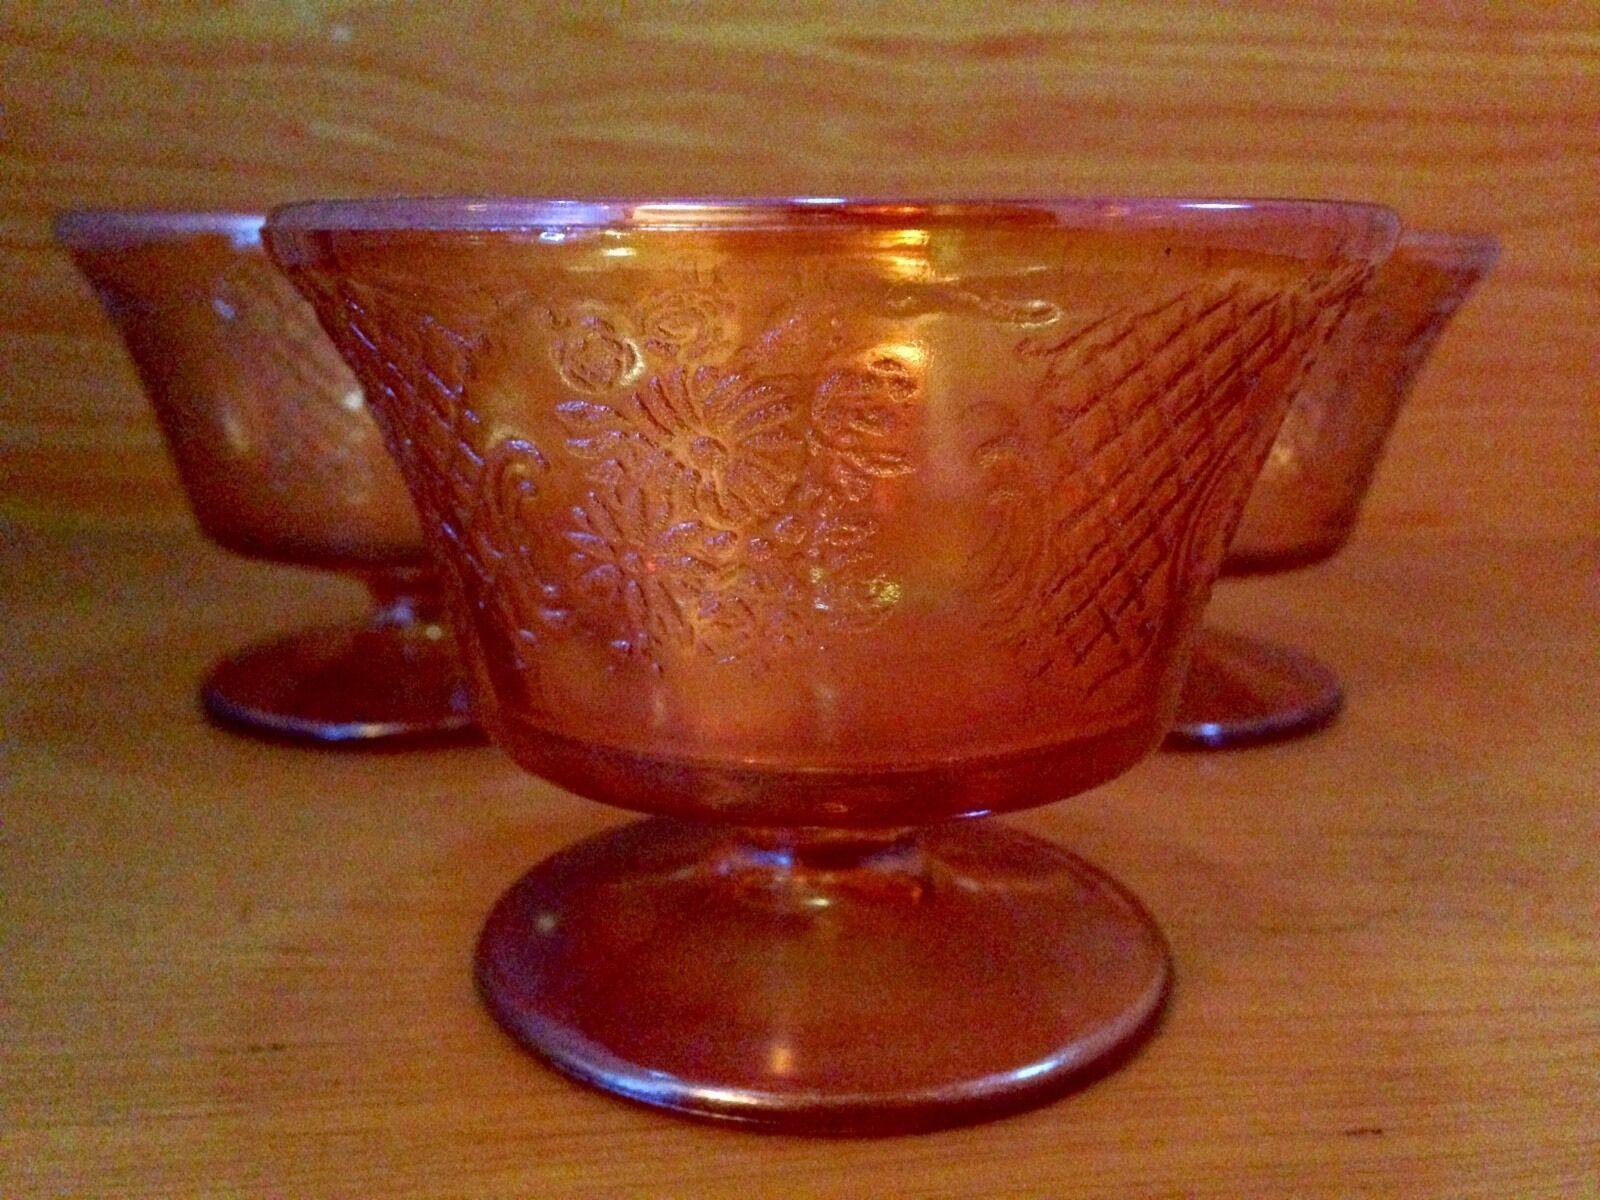 Vintage 3 pc. Carnival Glass Sherbet Ice Cream Dish Set image 4